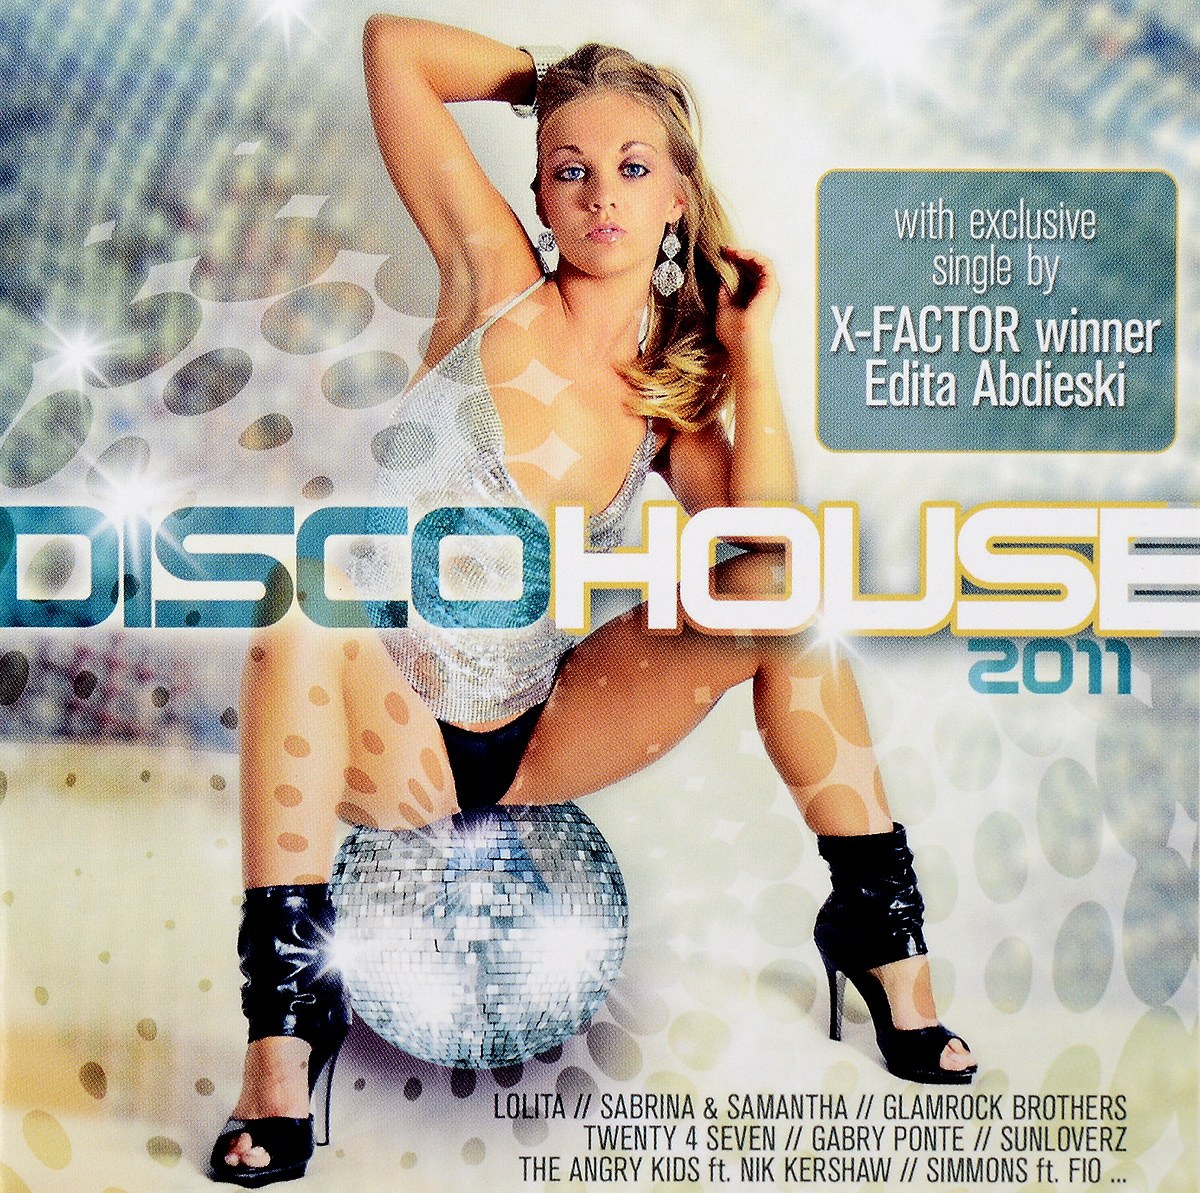 Lolita,House-Maxx,The Angry Kids,Ник Кершоу,Gabry Ponte,Кристиан Марчи,Оскар Сальжуэро,Рокфорд Крис,Gina M. Brown,Сабрина Салерно,Santiago Cortes,Manuel Baccano,Disco Deejays,Discotronix,Richtberg & Wojkowski,Sunloverz,Skreatch,Крис Галмон,Pronto,Eiffel 65 Disco House 2011 (2 CD) disco house 2016 2 cd